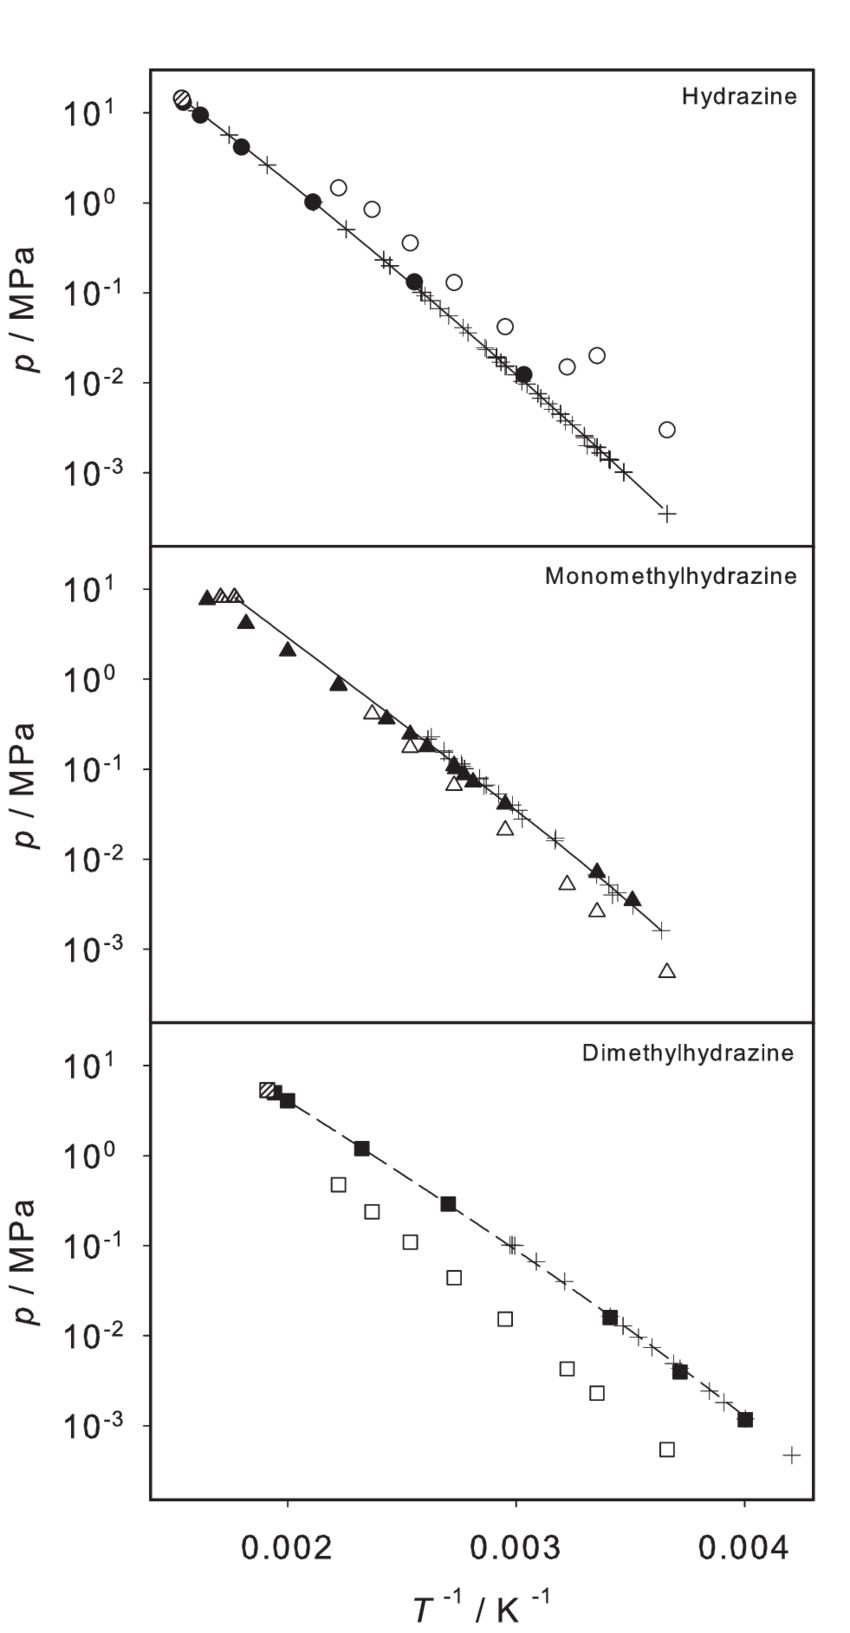 hight resolution of logarithmic vapor pressure of hydrazine monomethylhydrazine and dimethylhydrazine